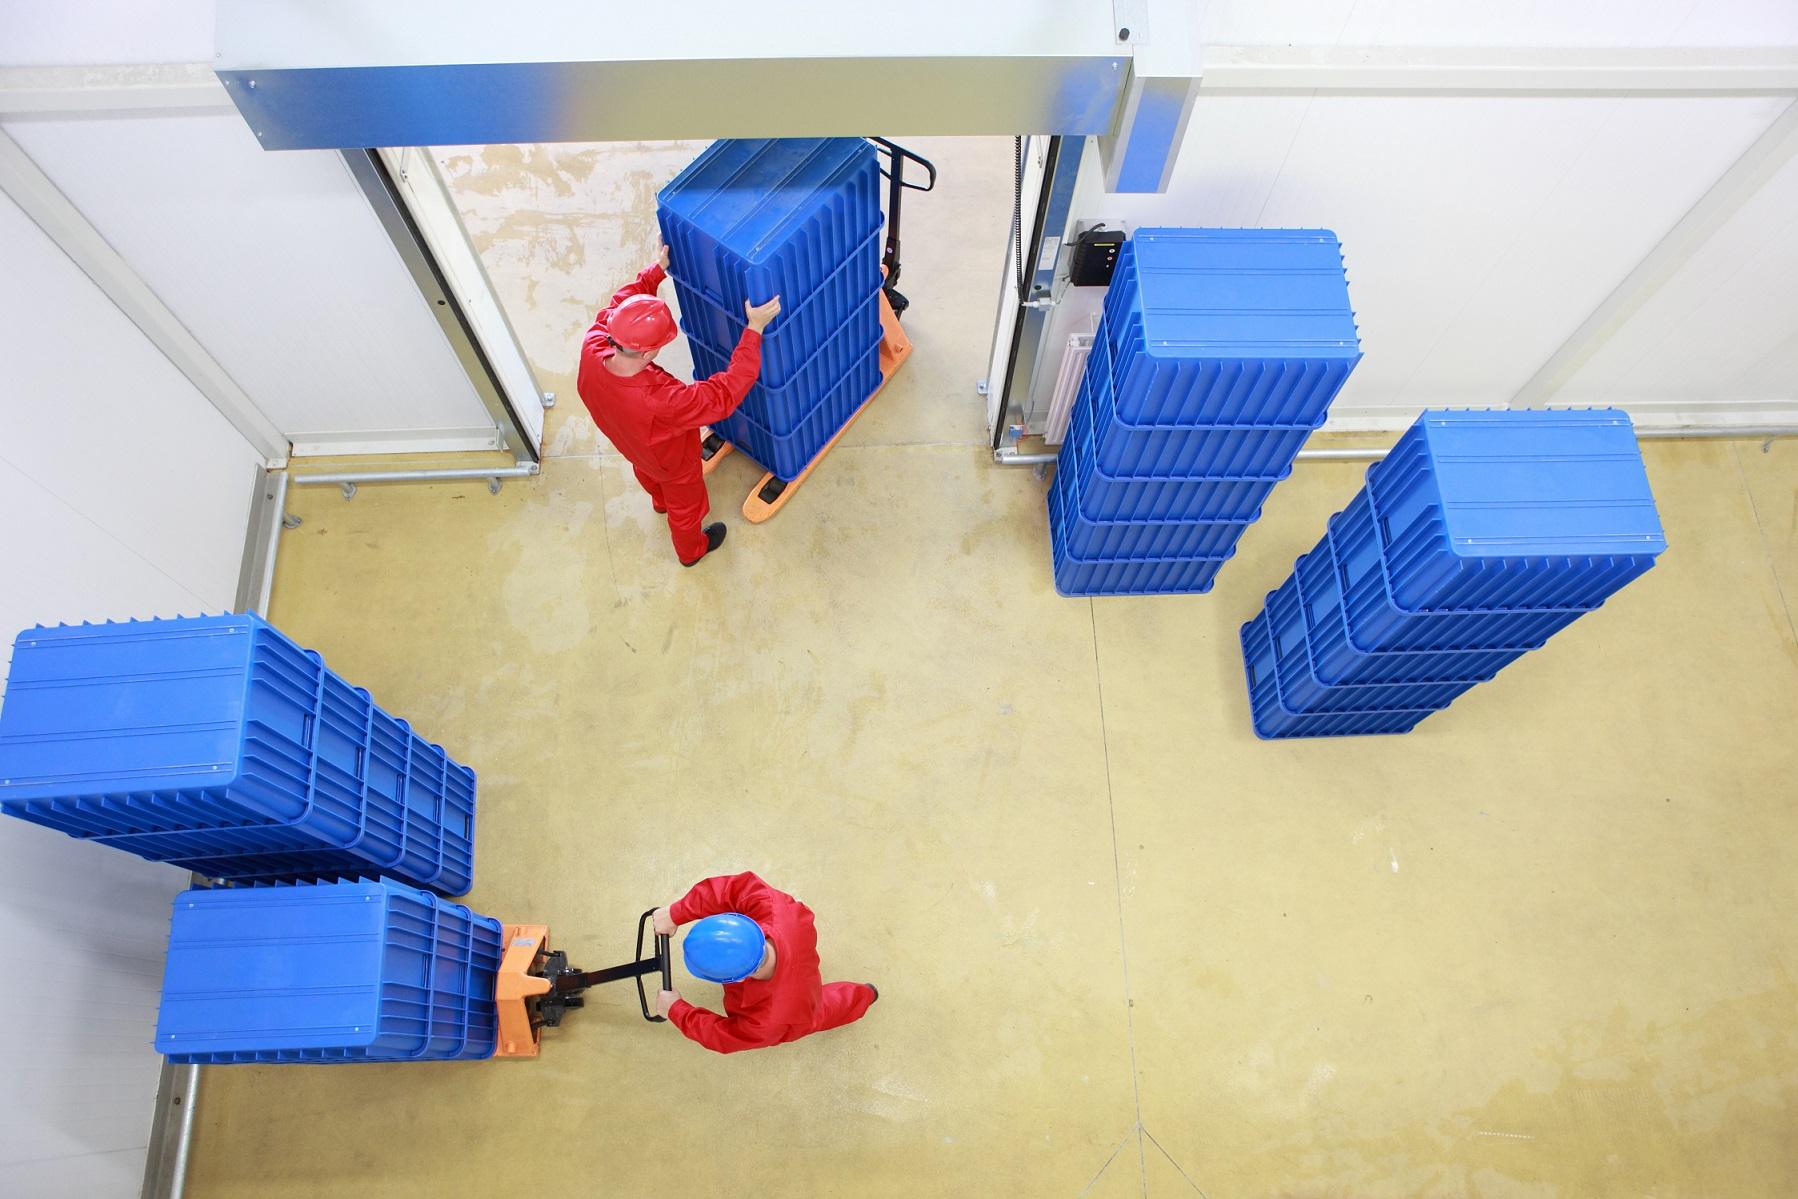 Faltboxen aus Kunststoff